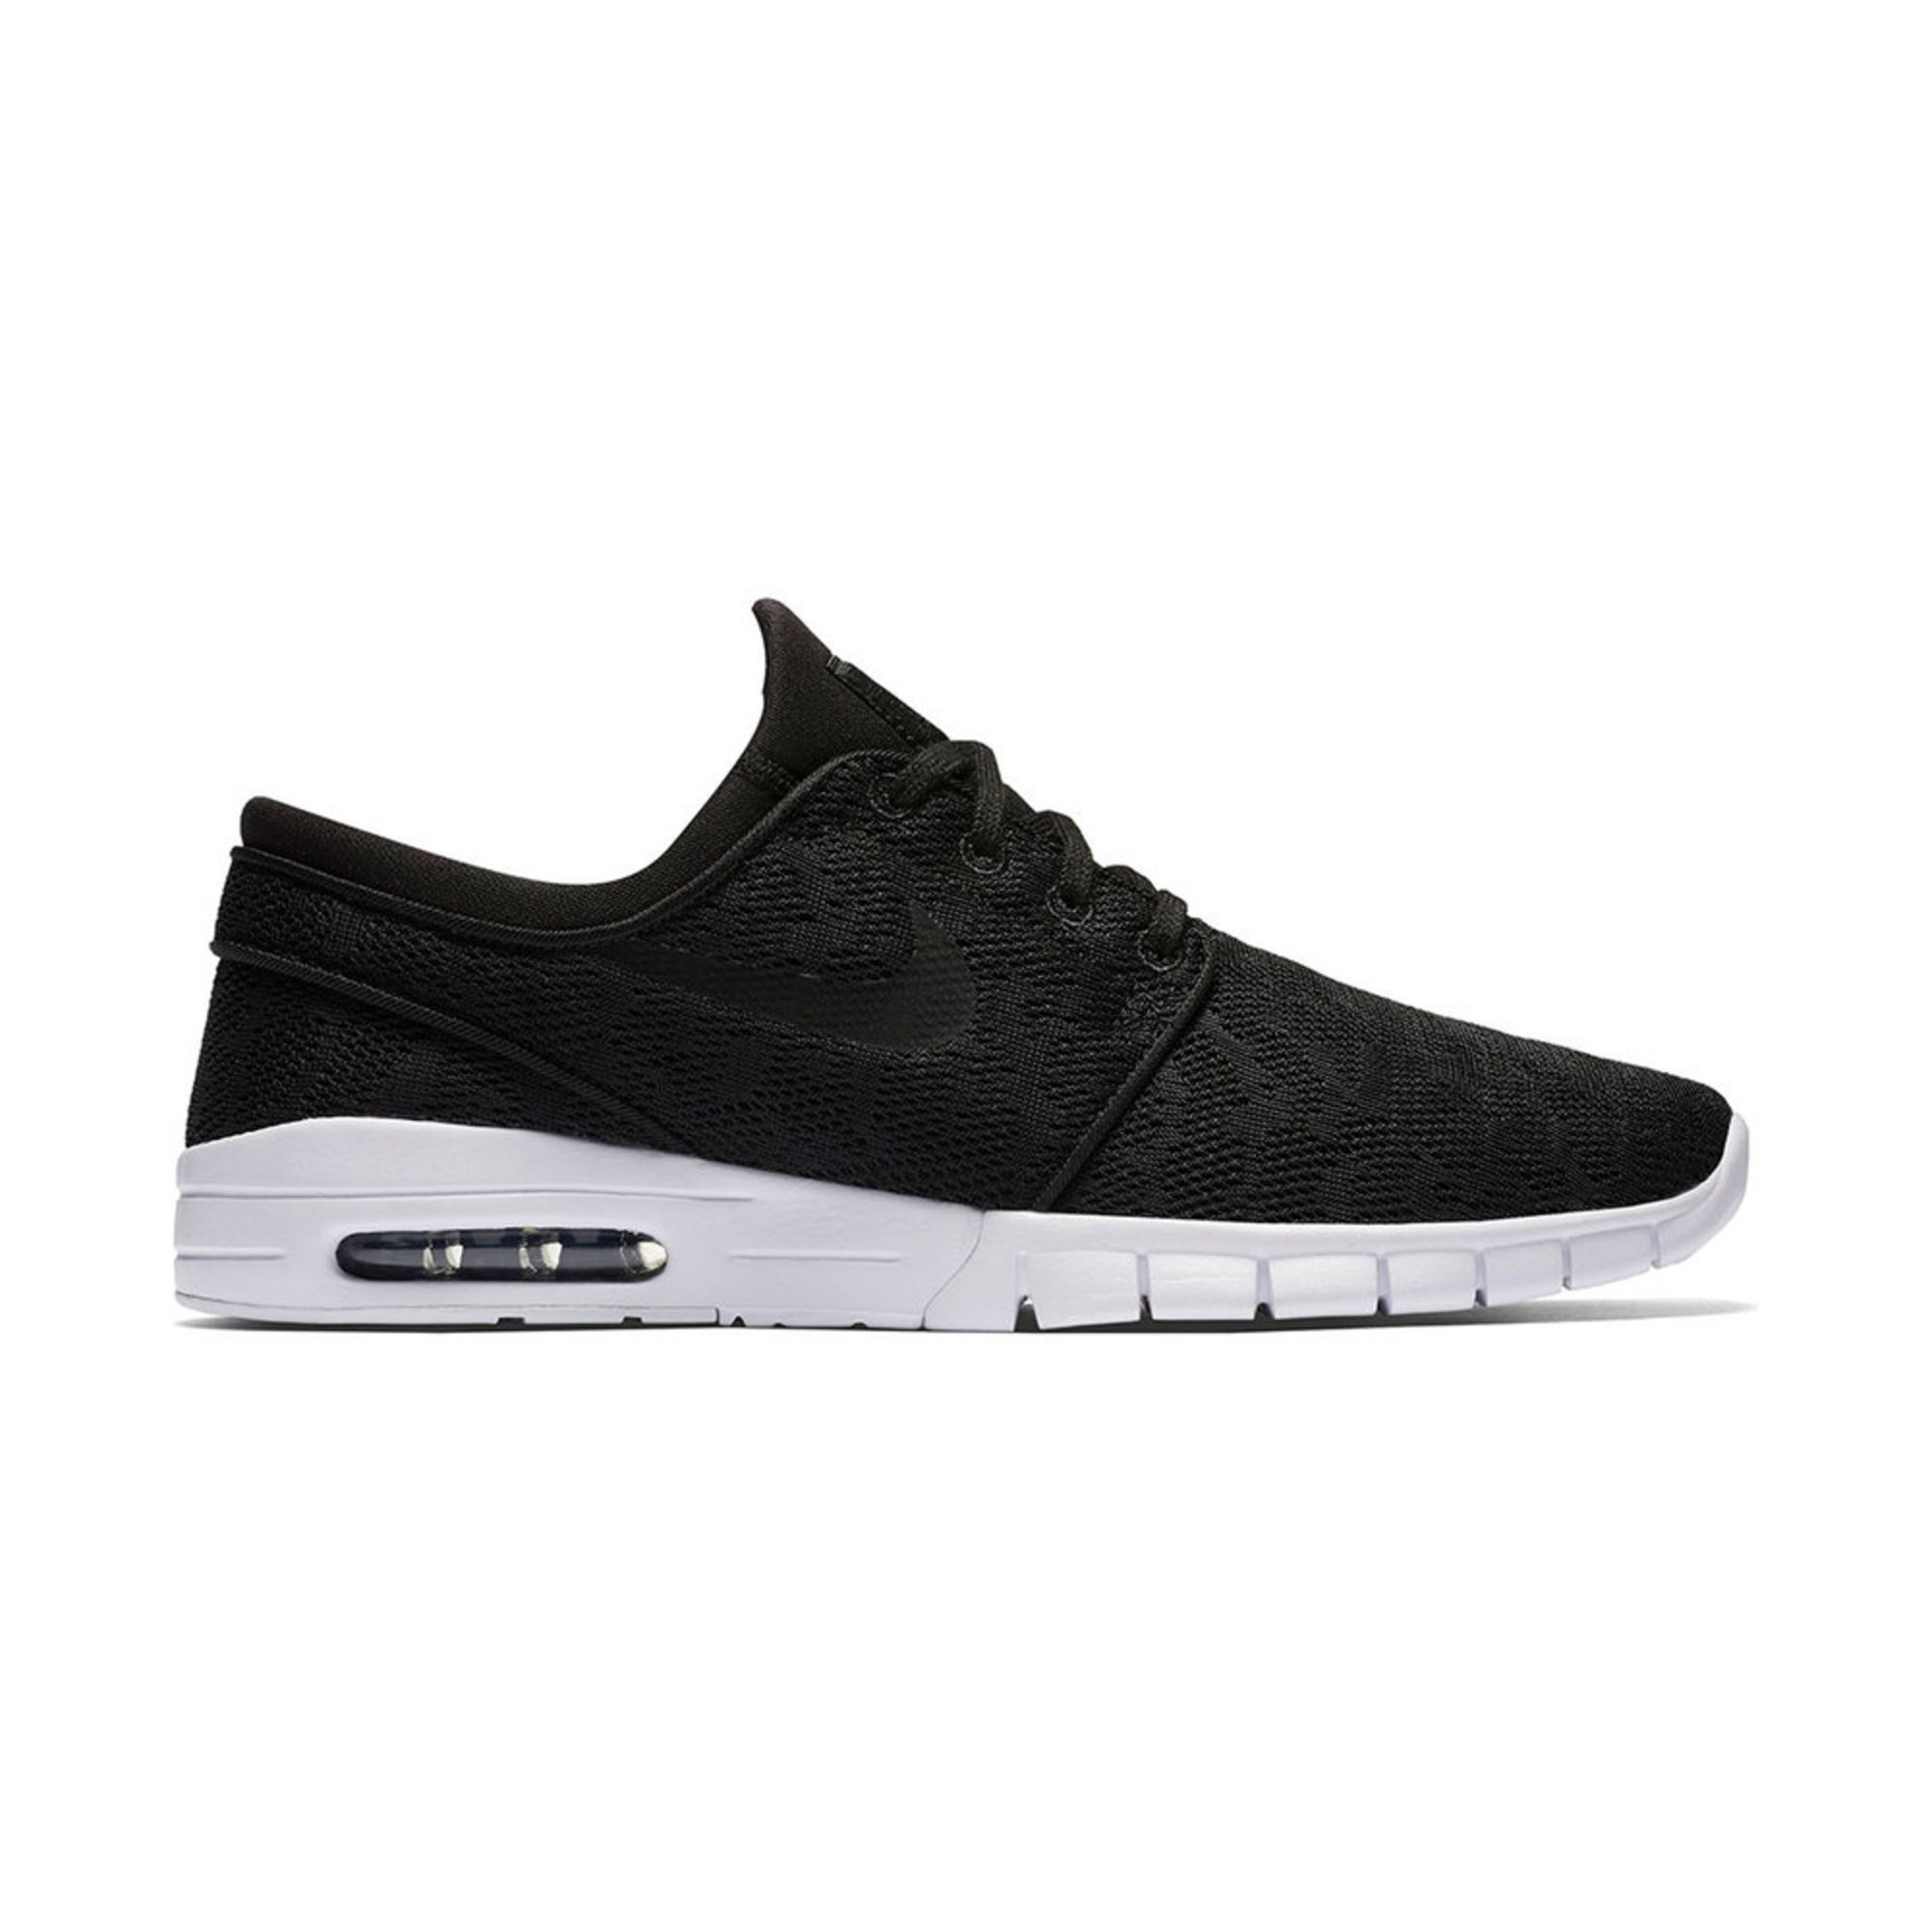 4ca4528930 Nike Sb Men's Stefan Janoski Max Skate Shoe | Men's Lifestyle ...